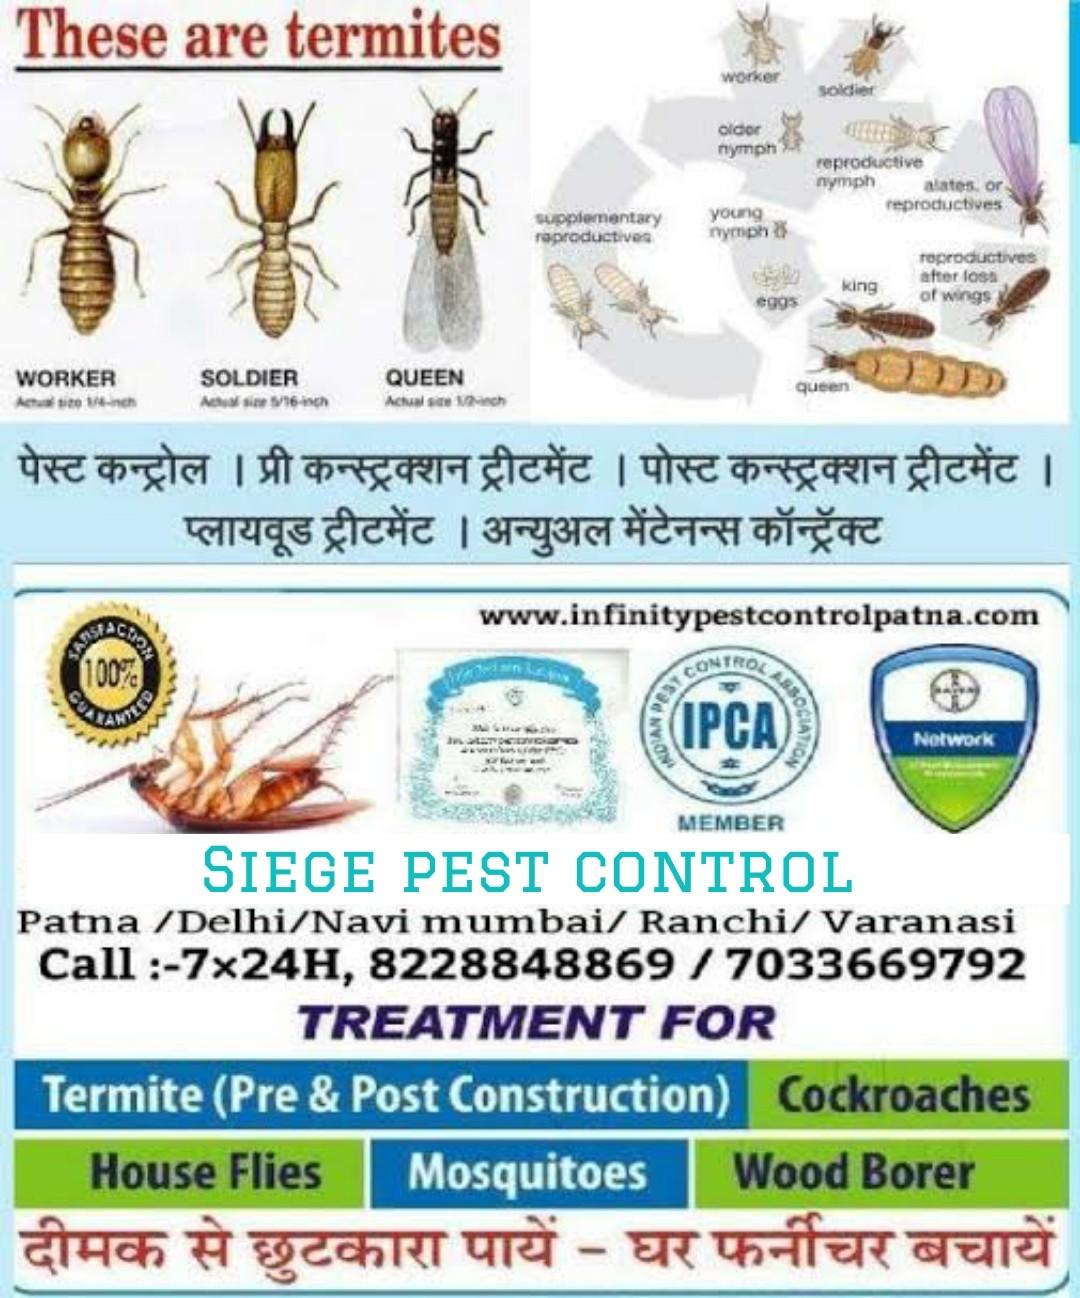 Infinity pest control